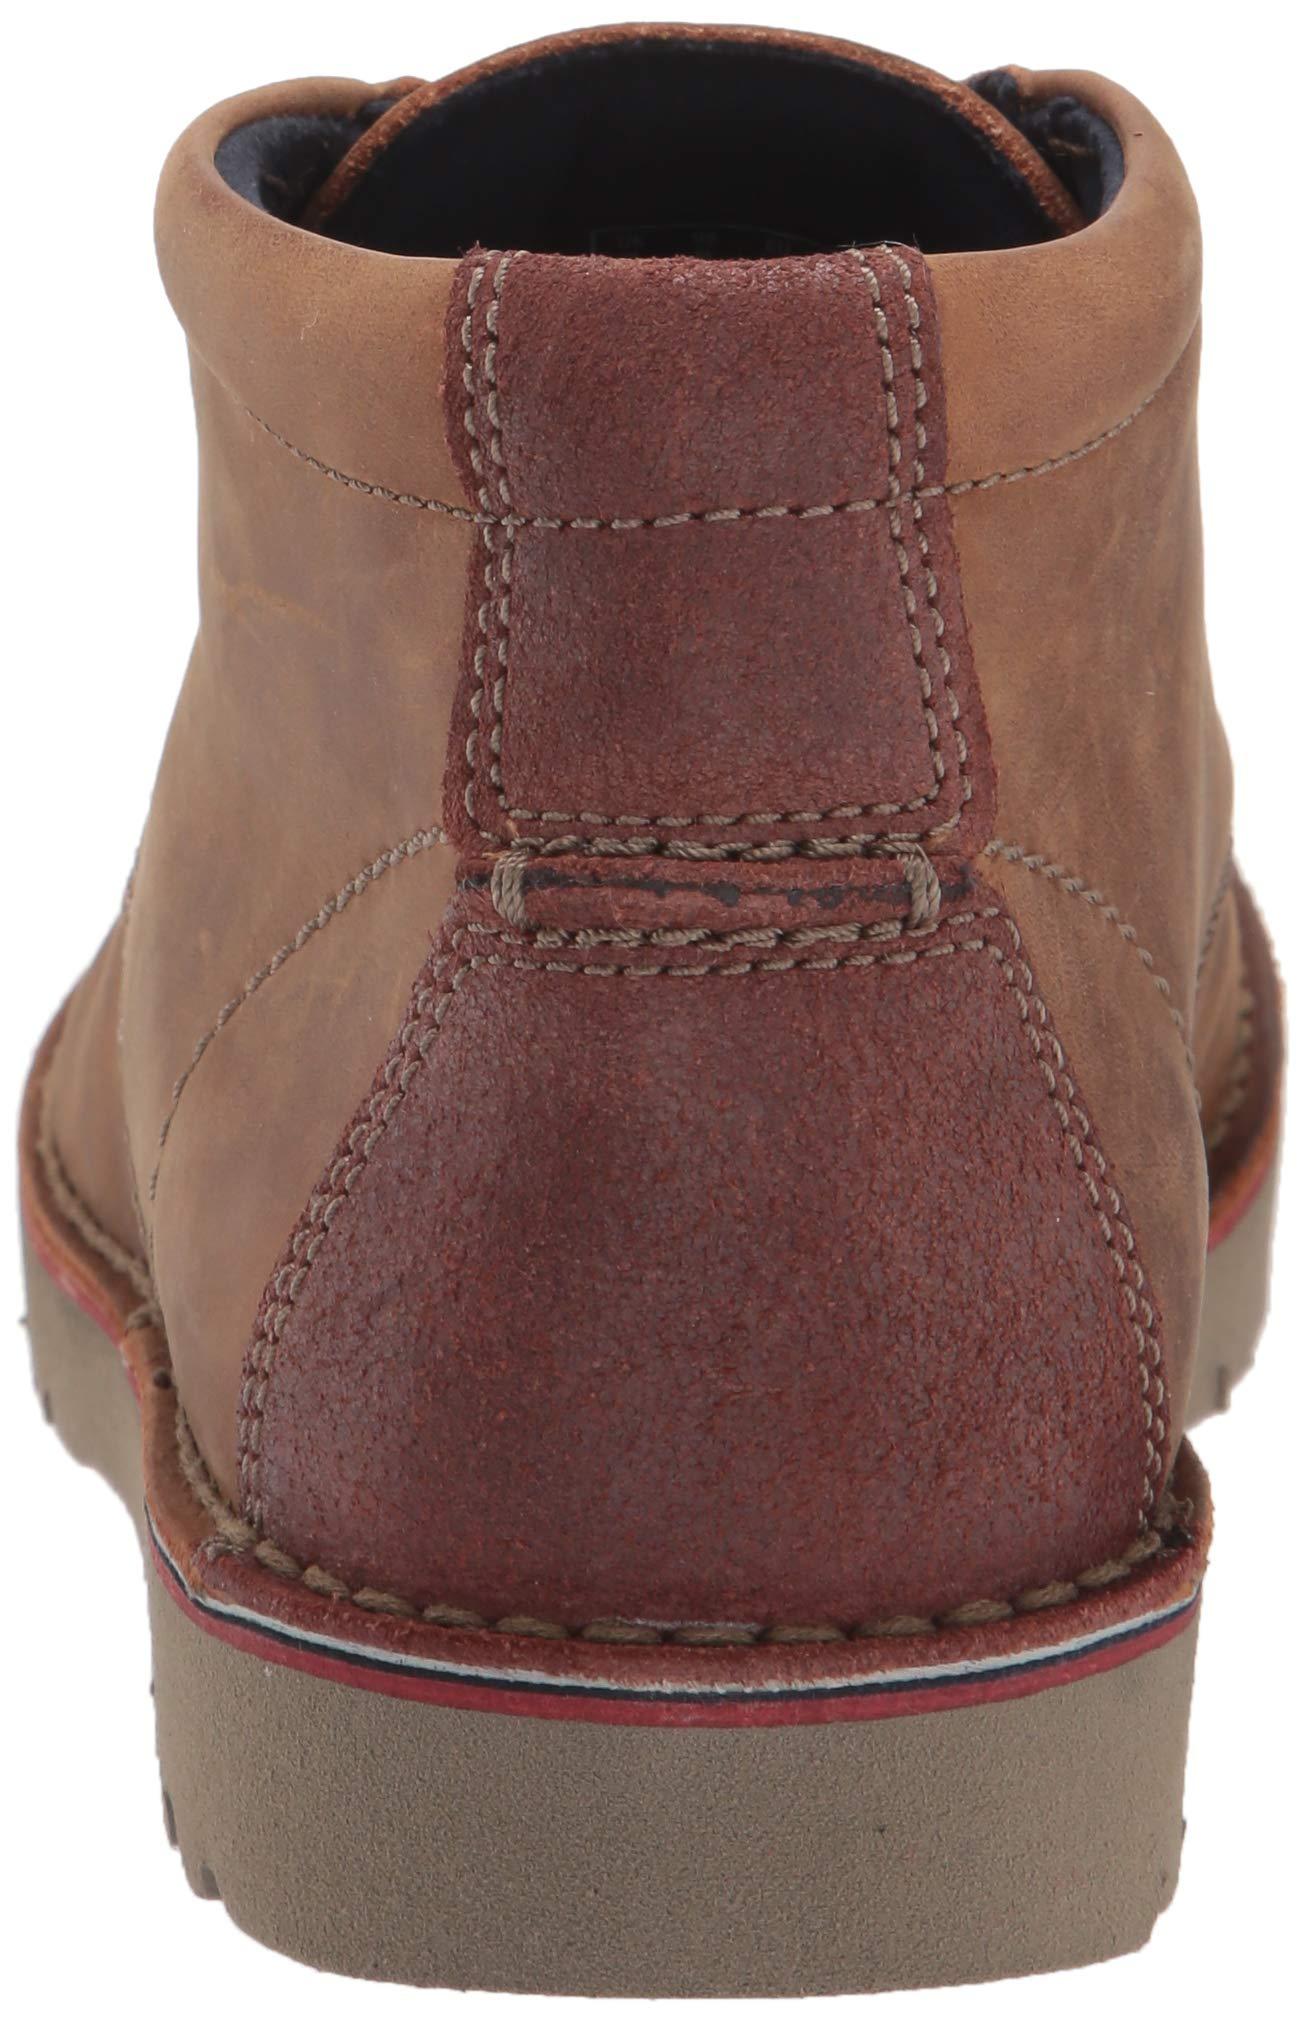 Clarks Men's Vargo Apron Ankle Boot 2